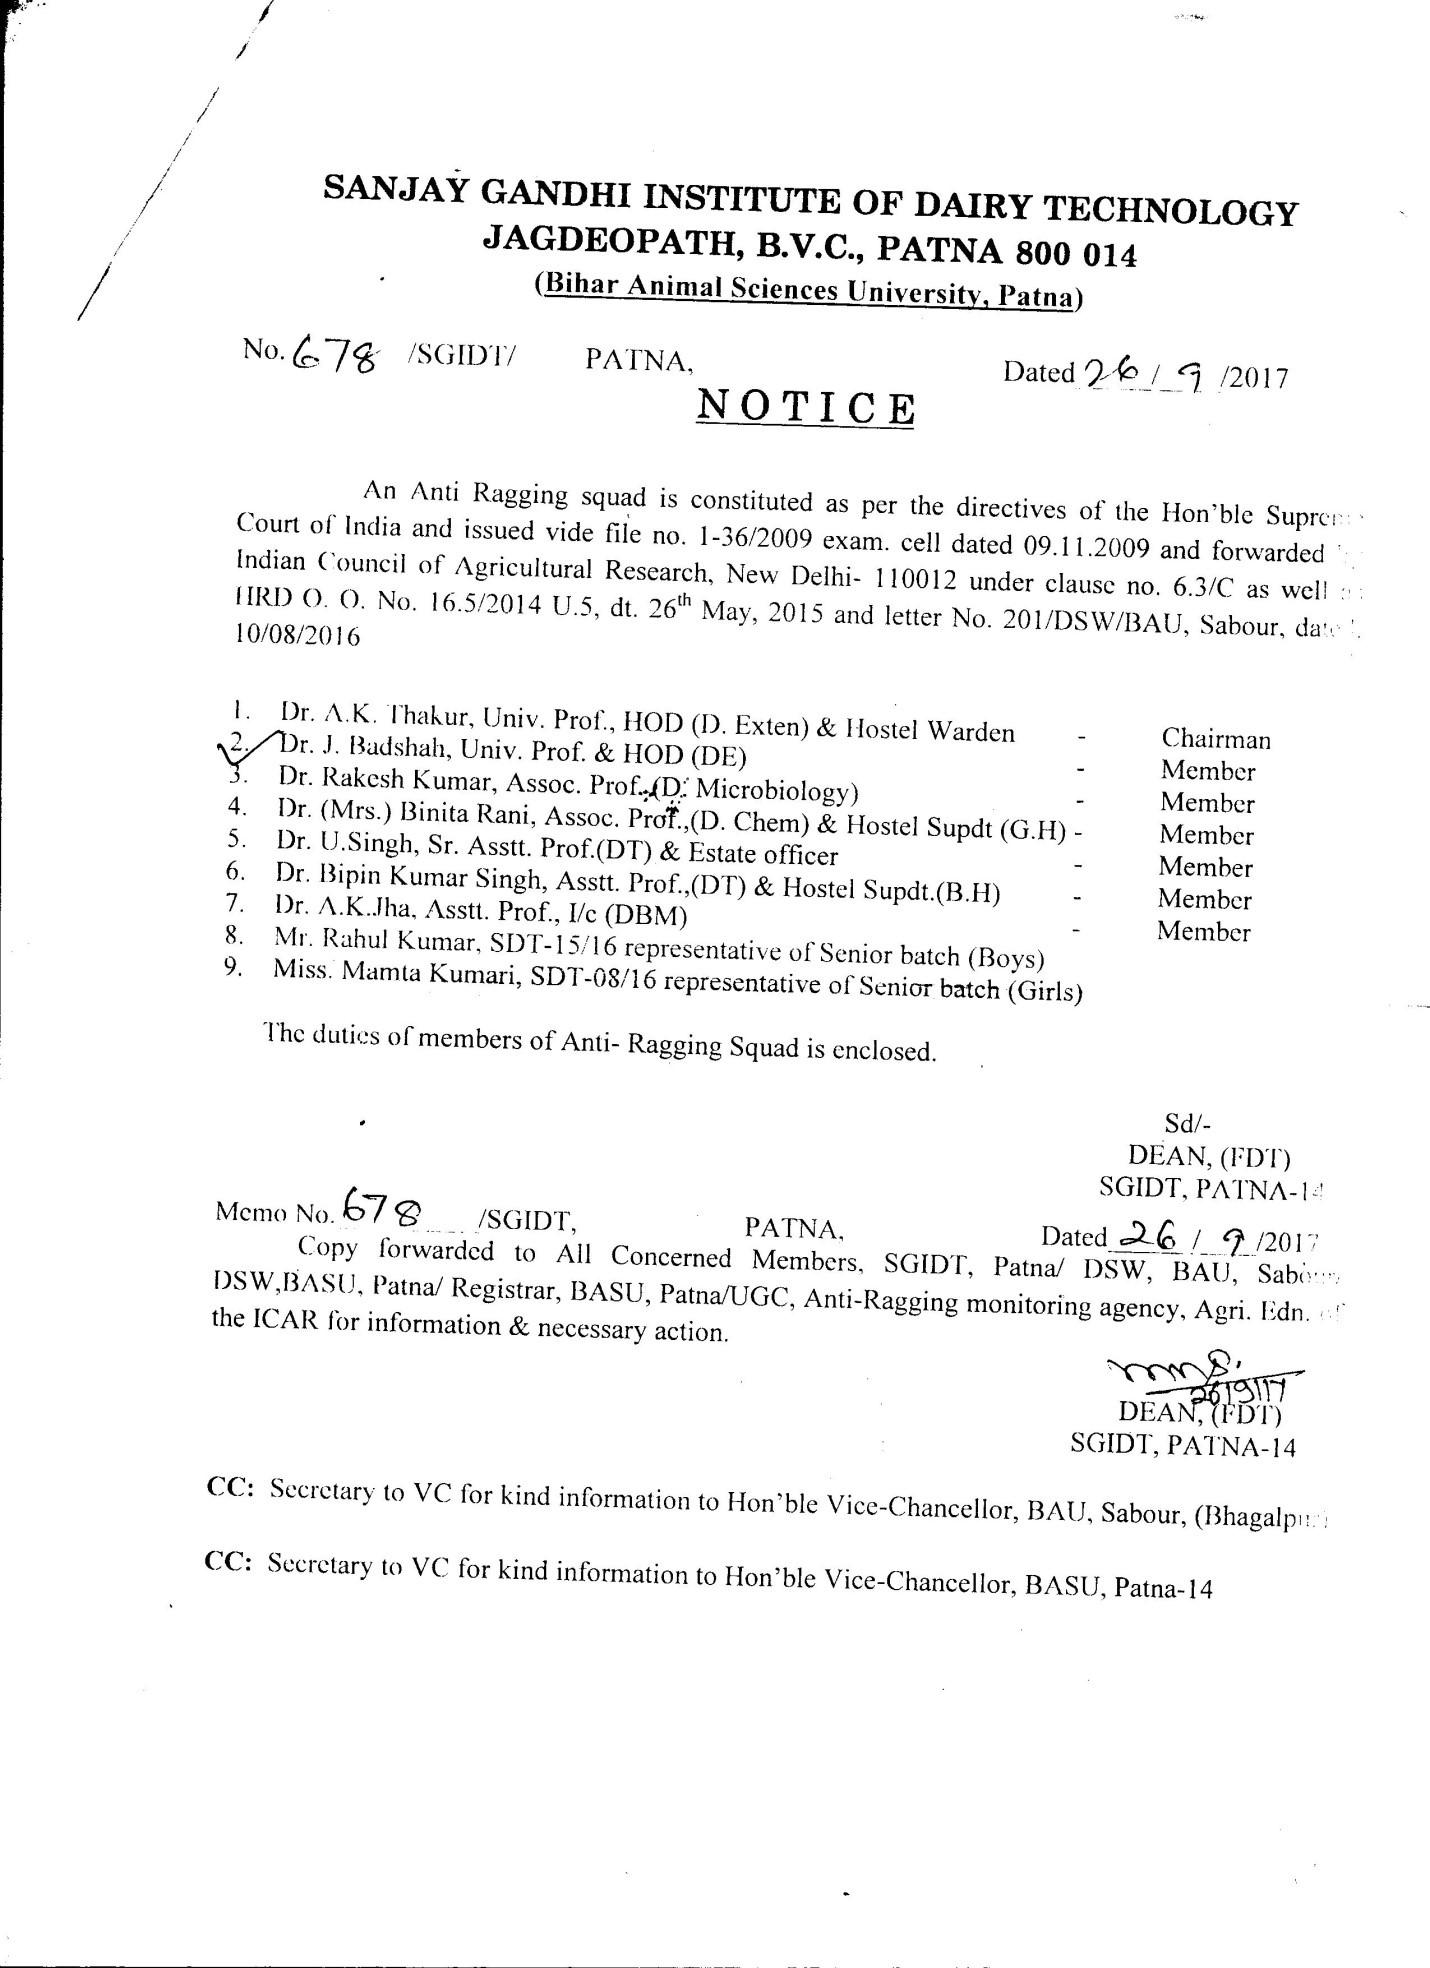 Sanjay Gandhi Institute of Dairy Technology (SGIDT) – Bihar Animal